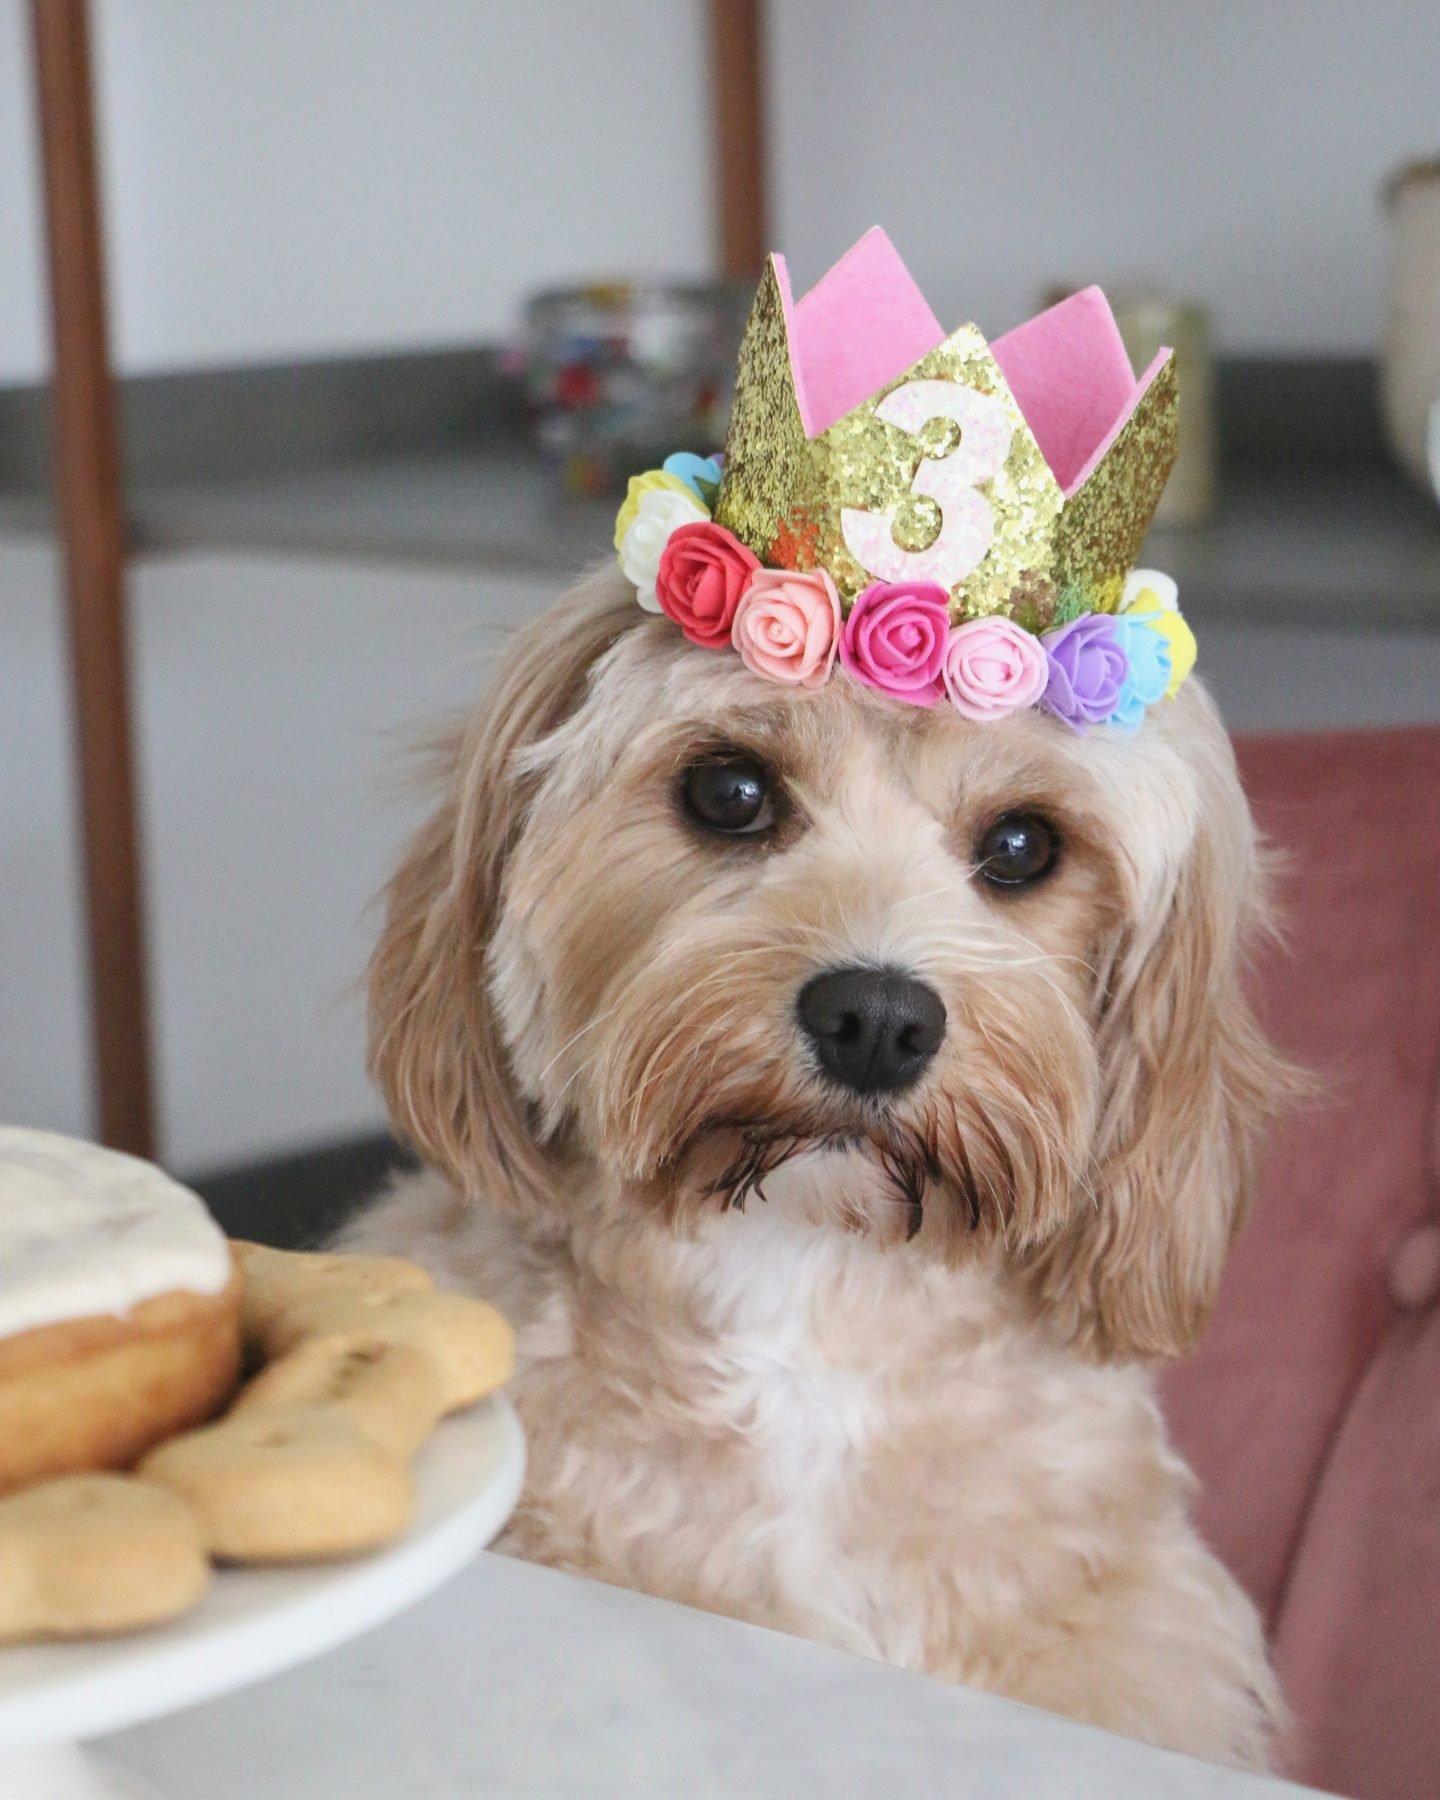 Astounding Dog Birthday Cake Recipe Banana Peanut Butter Personalised Birthday Cards Veneteletsinfo